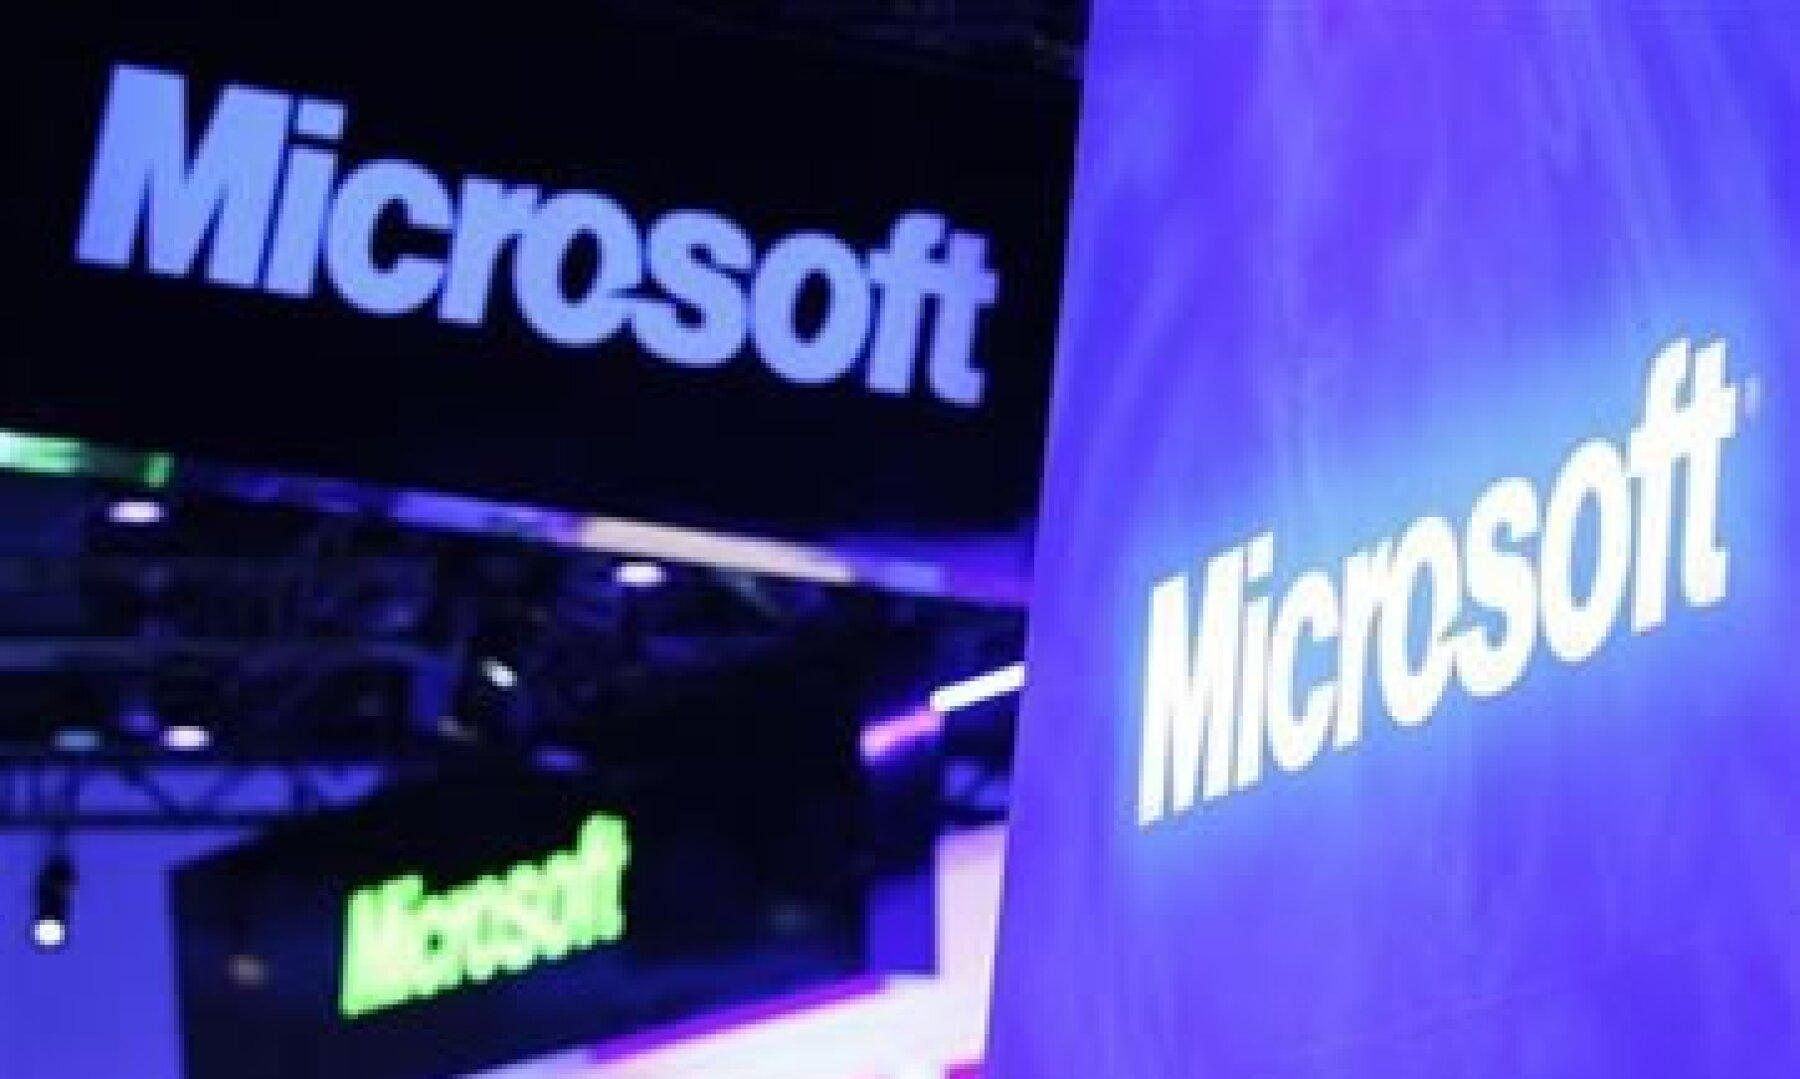 Microsoft espera reavivar las ventas de PCs cuando lance Windows 8. (Foto: Reuters)